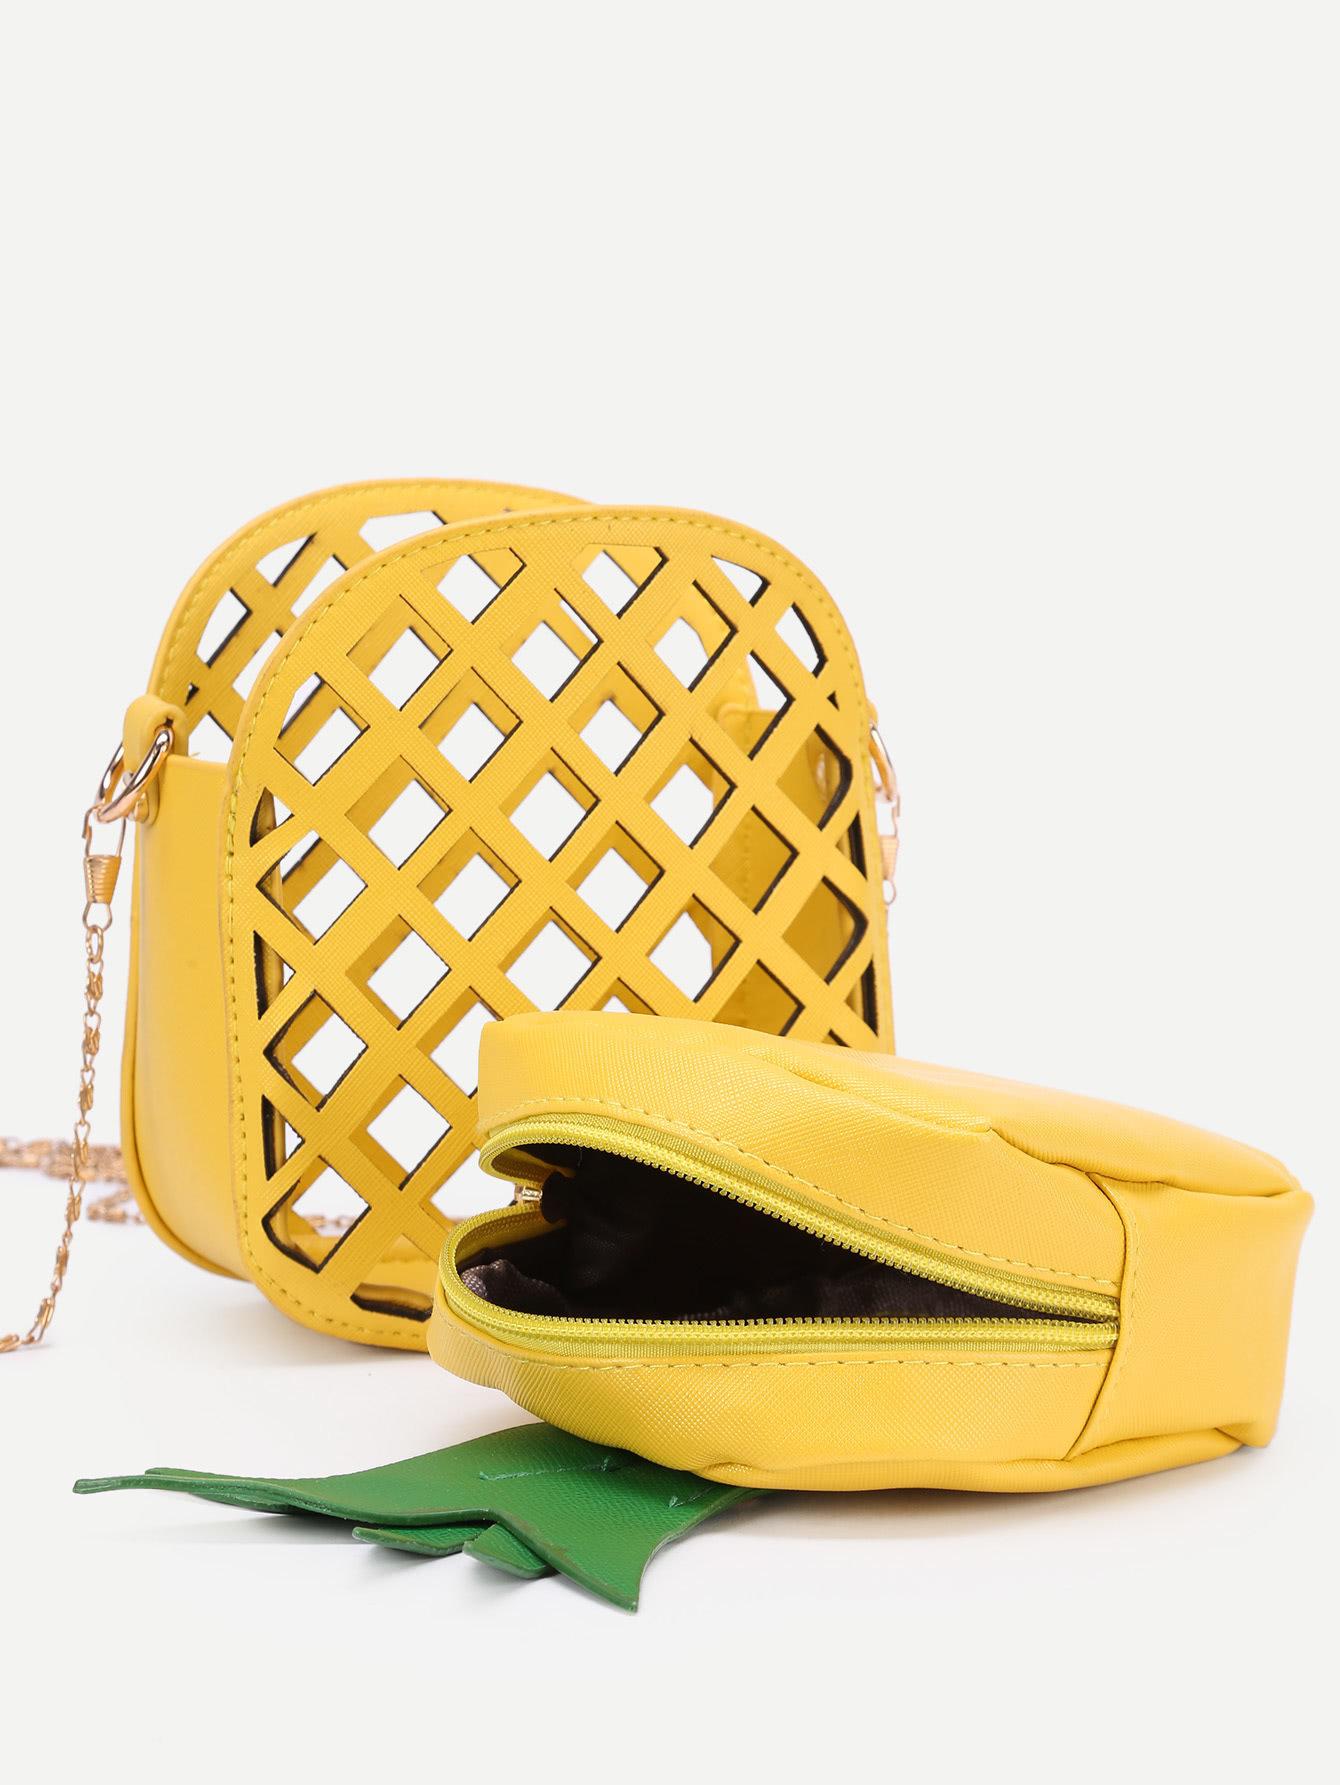 Sac à main Ananas jaune